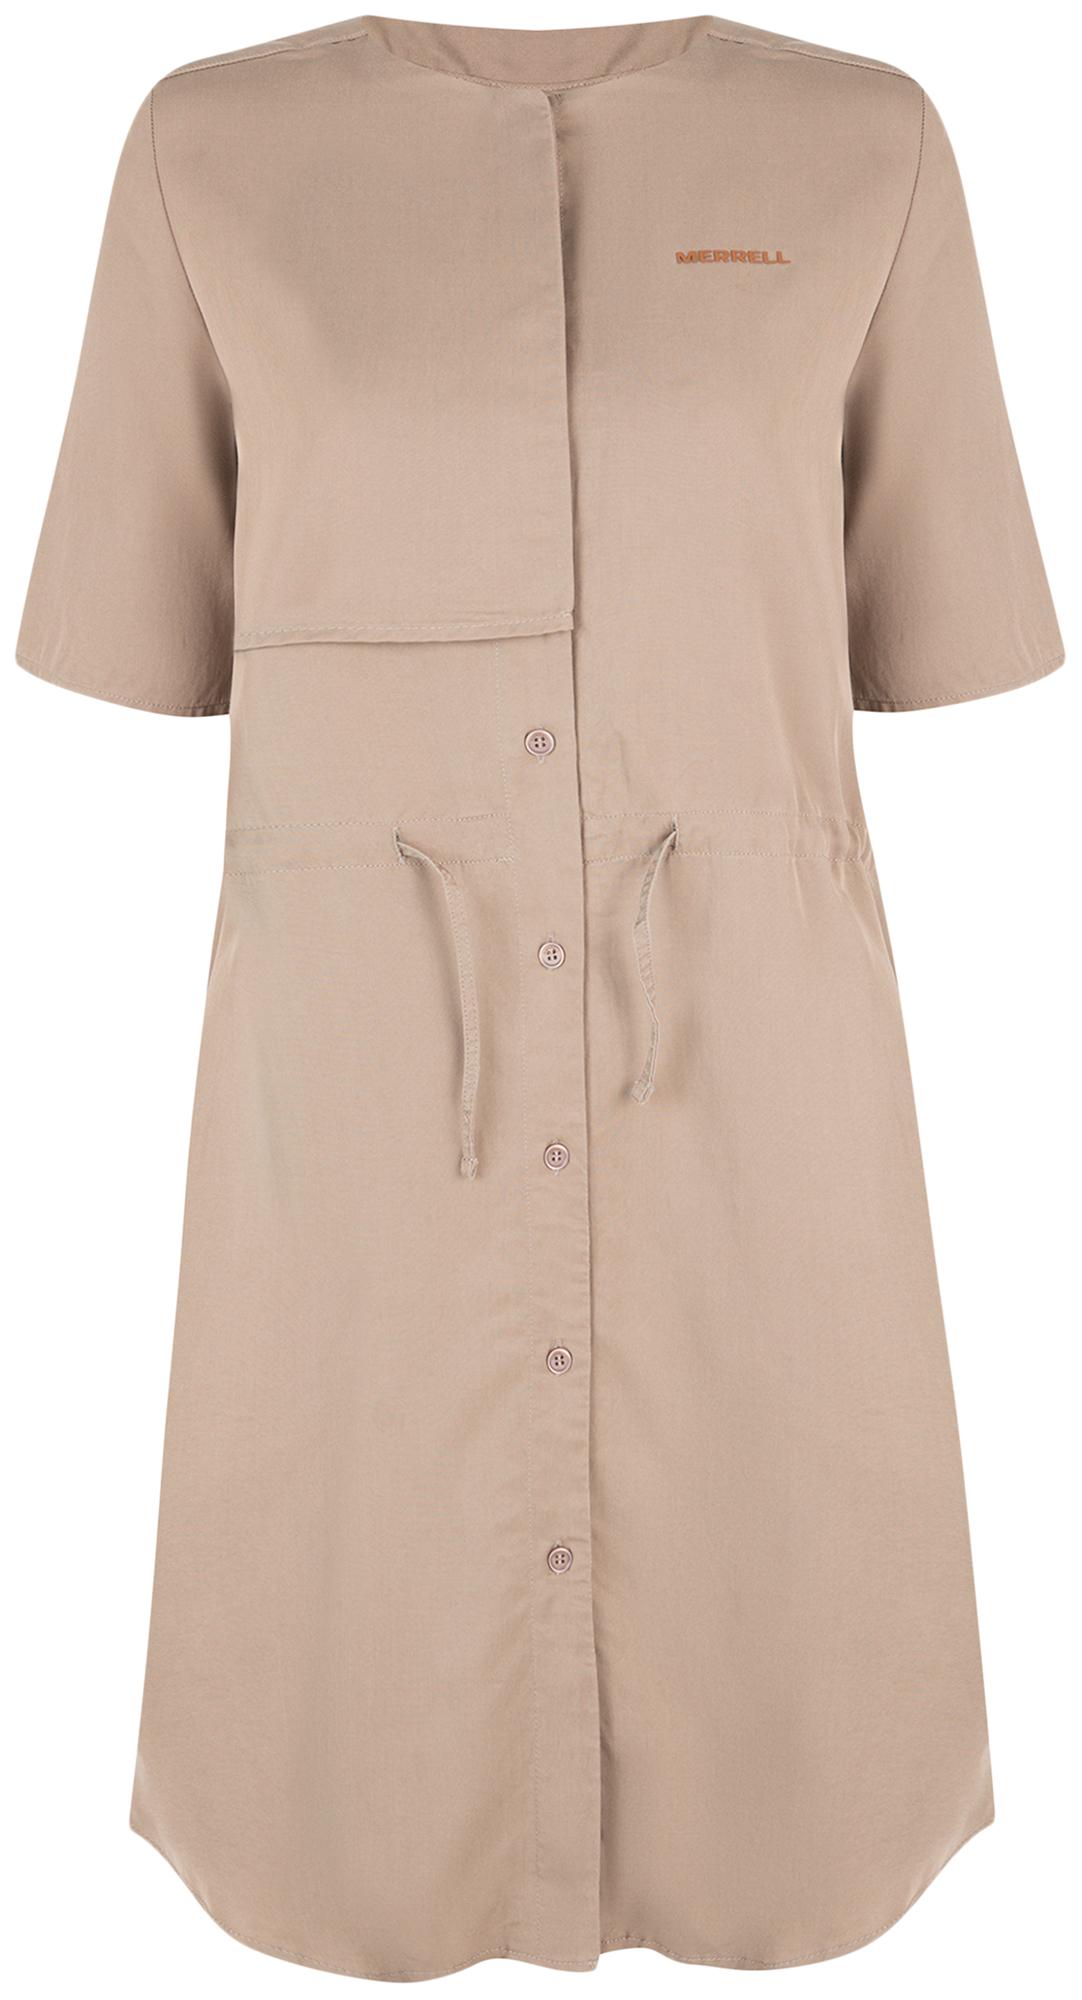 Merrell Платье женское Merrell, размер 42 женское платье new brand 2015fashion 587419